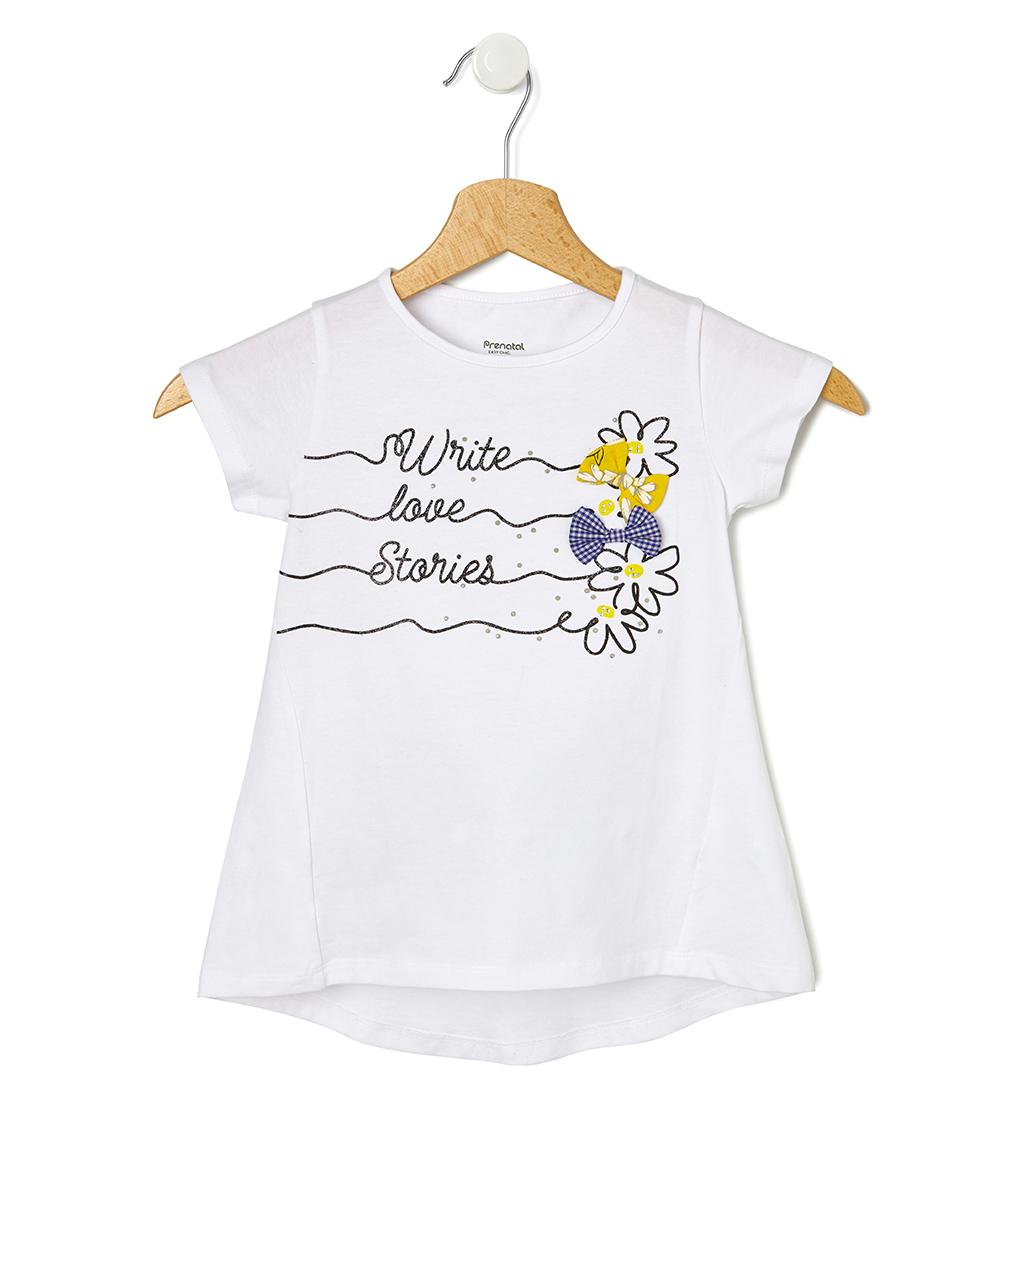 T-Shirt Jersey Λευκό με Στάμπα και Φιογκάκια για Κορίτσι